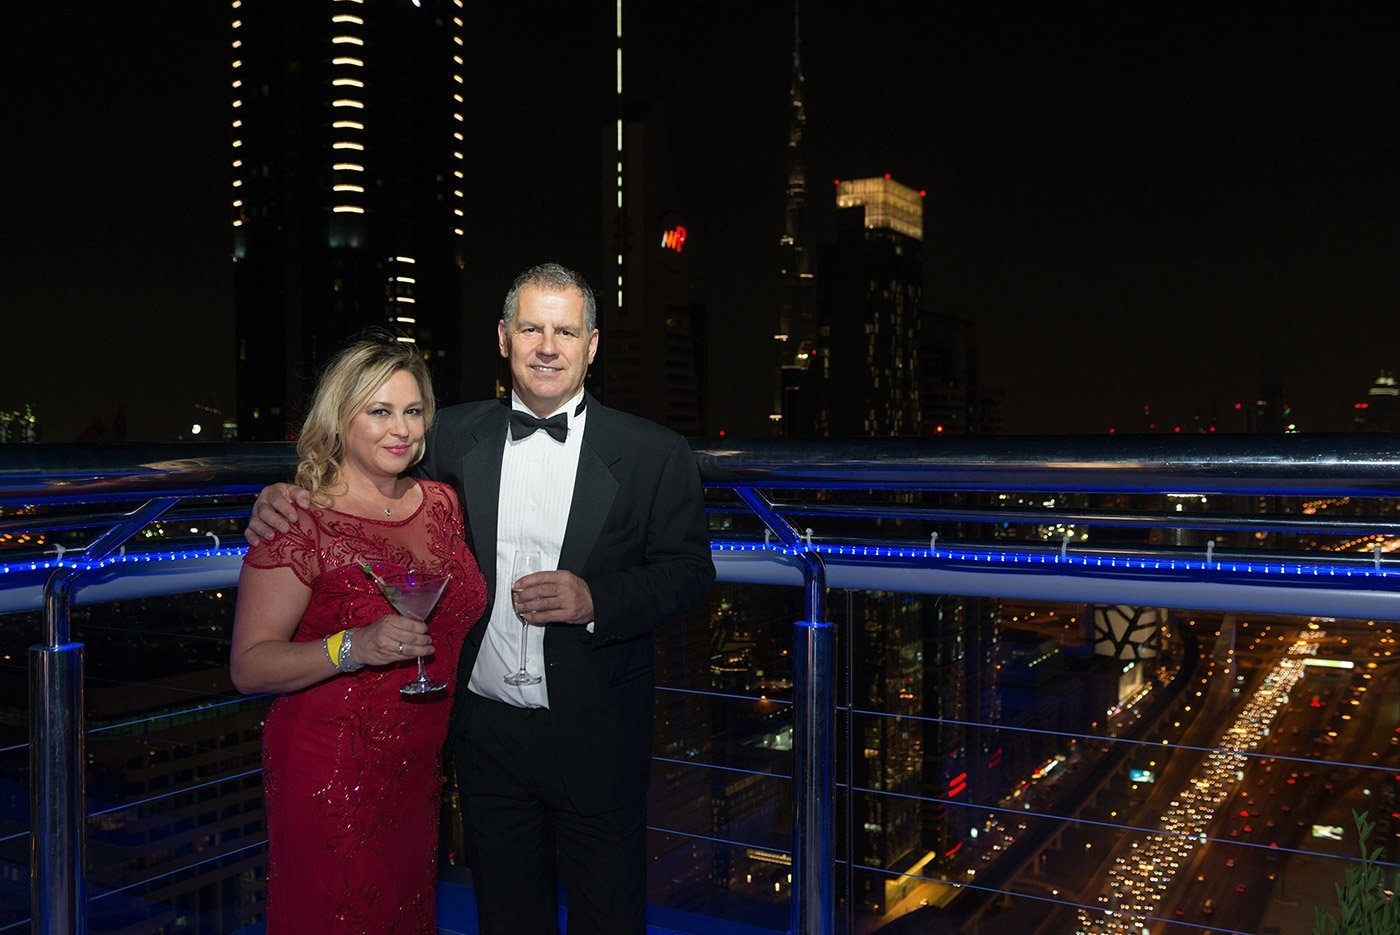 Nightlife Photography Dubai